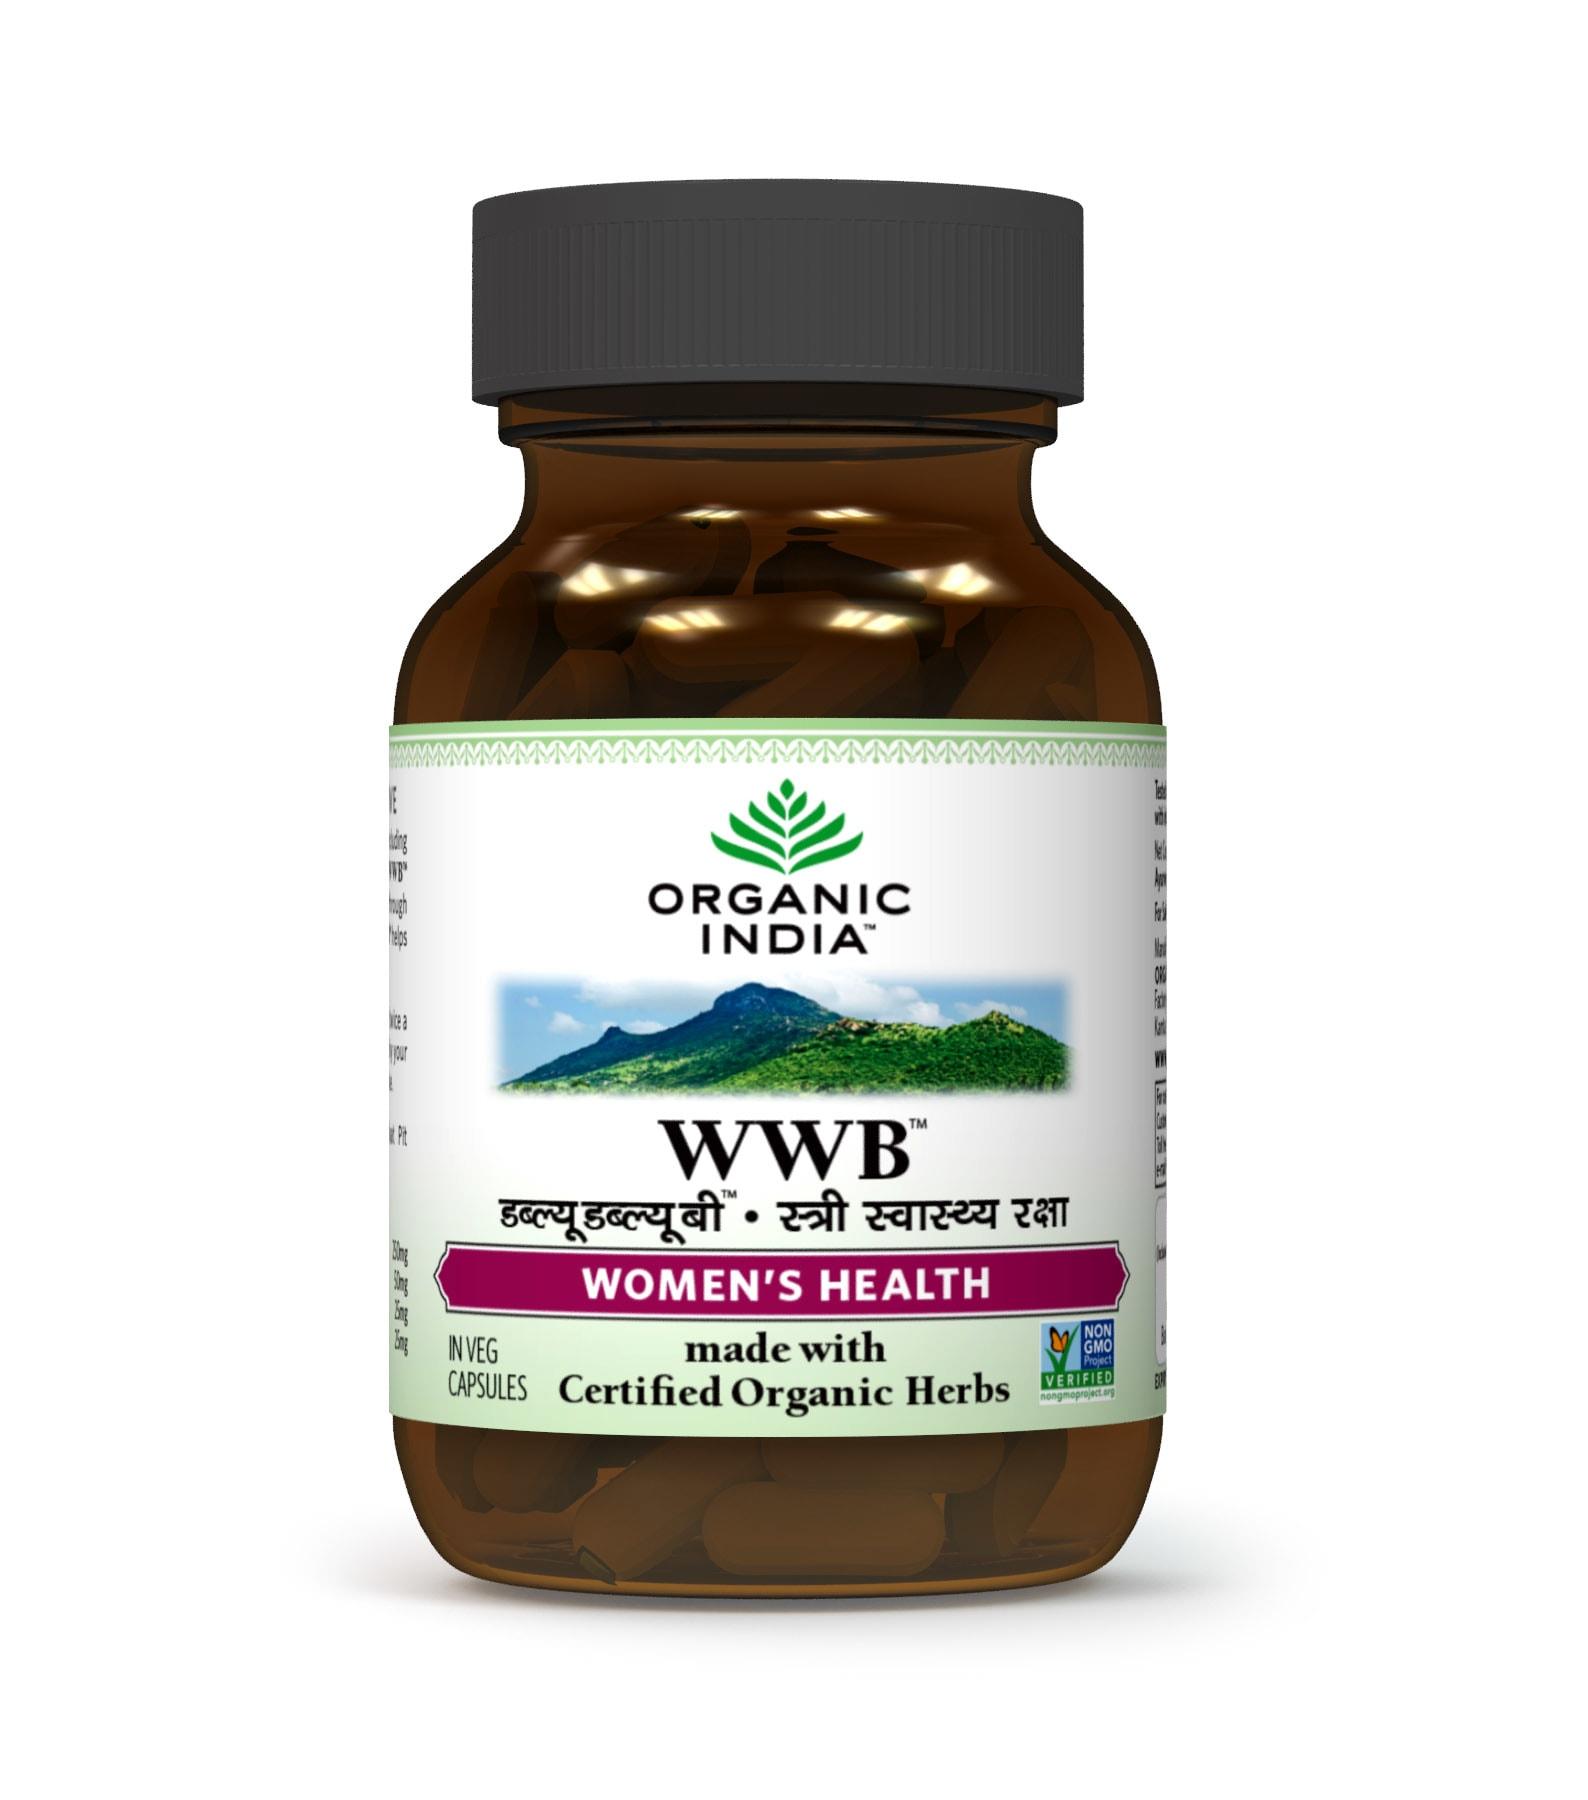 Organic India WWB Capsule